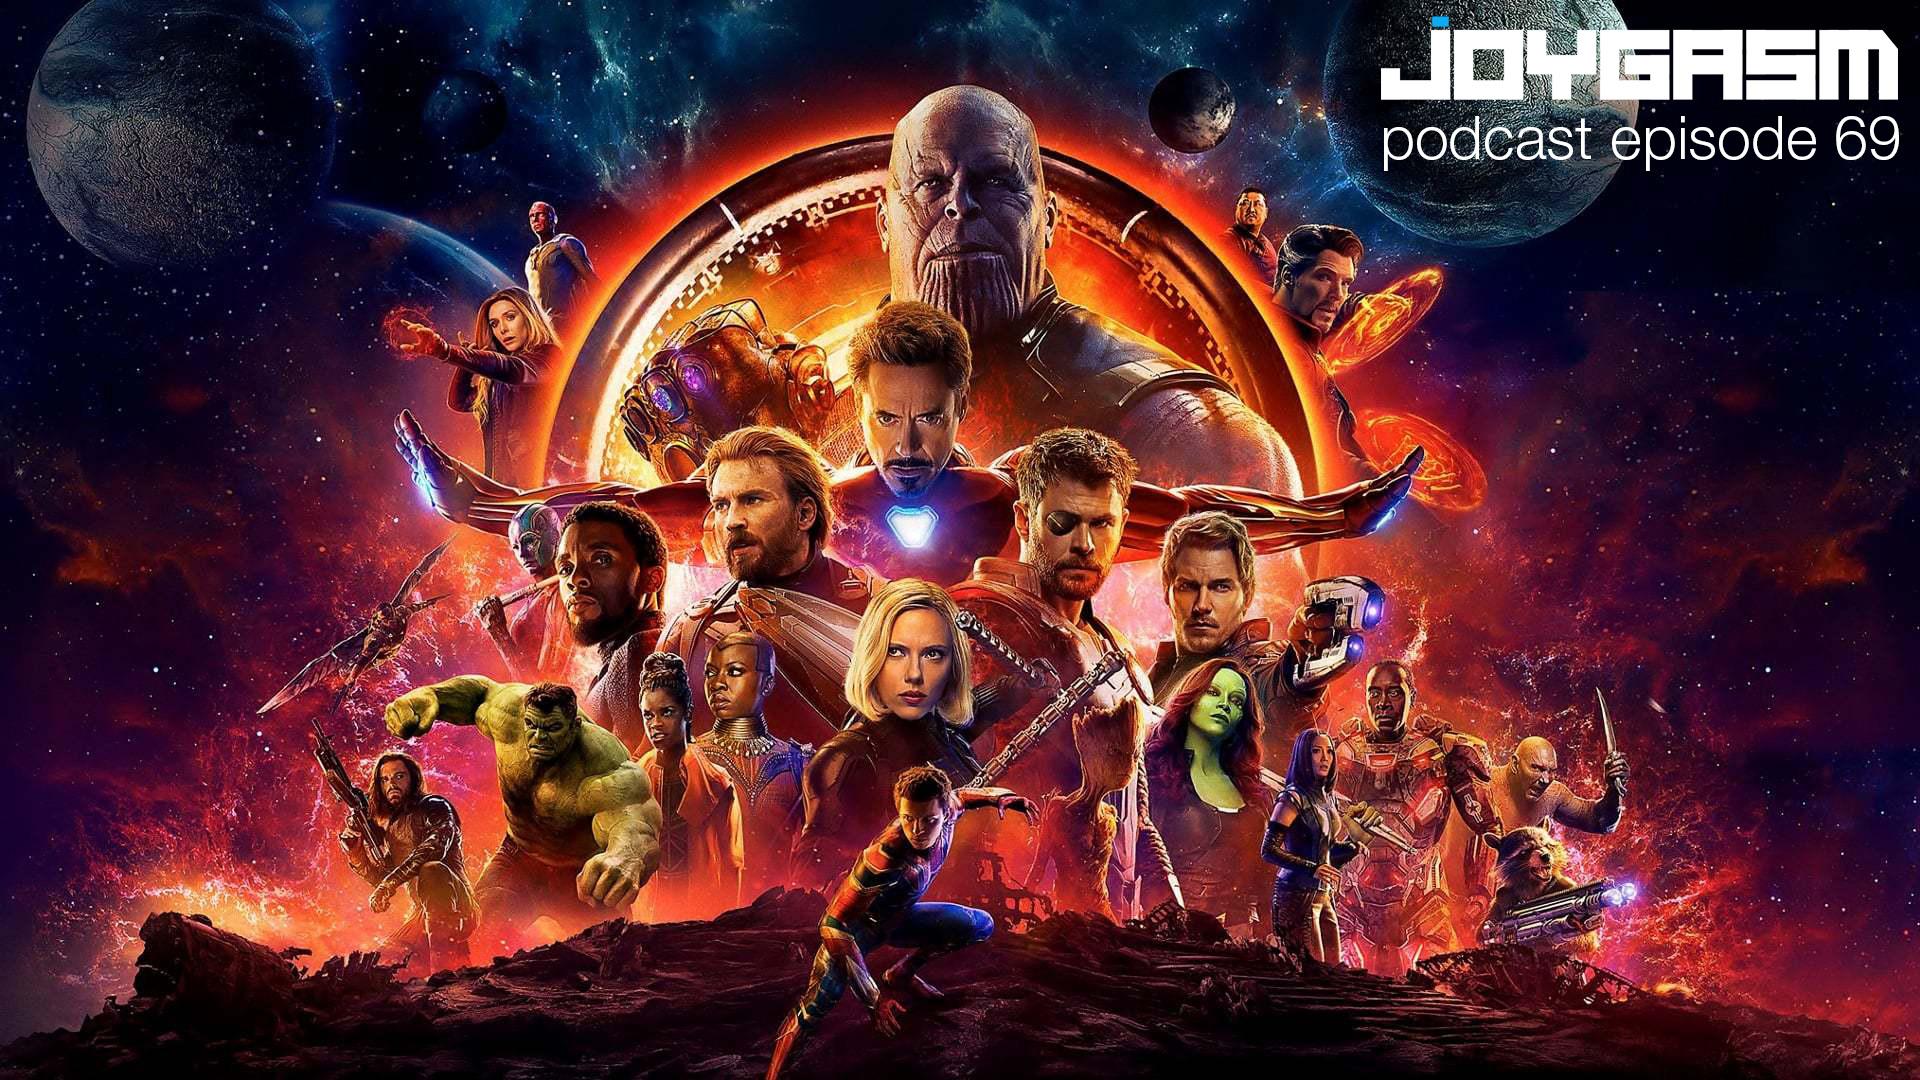 Ep. 69: Avengers Infinity War REVIEW (Spoiler Alert)